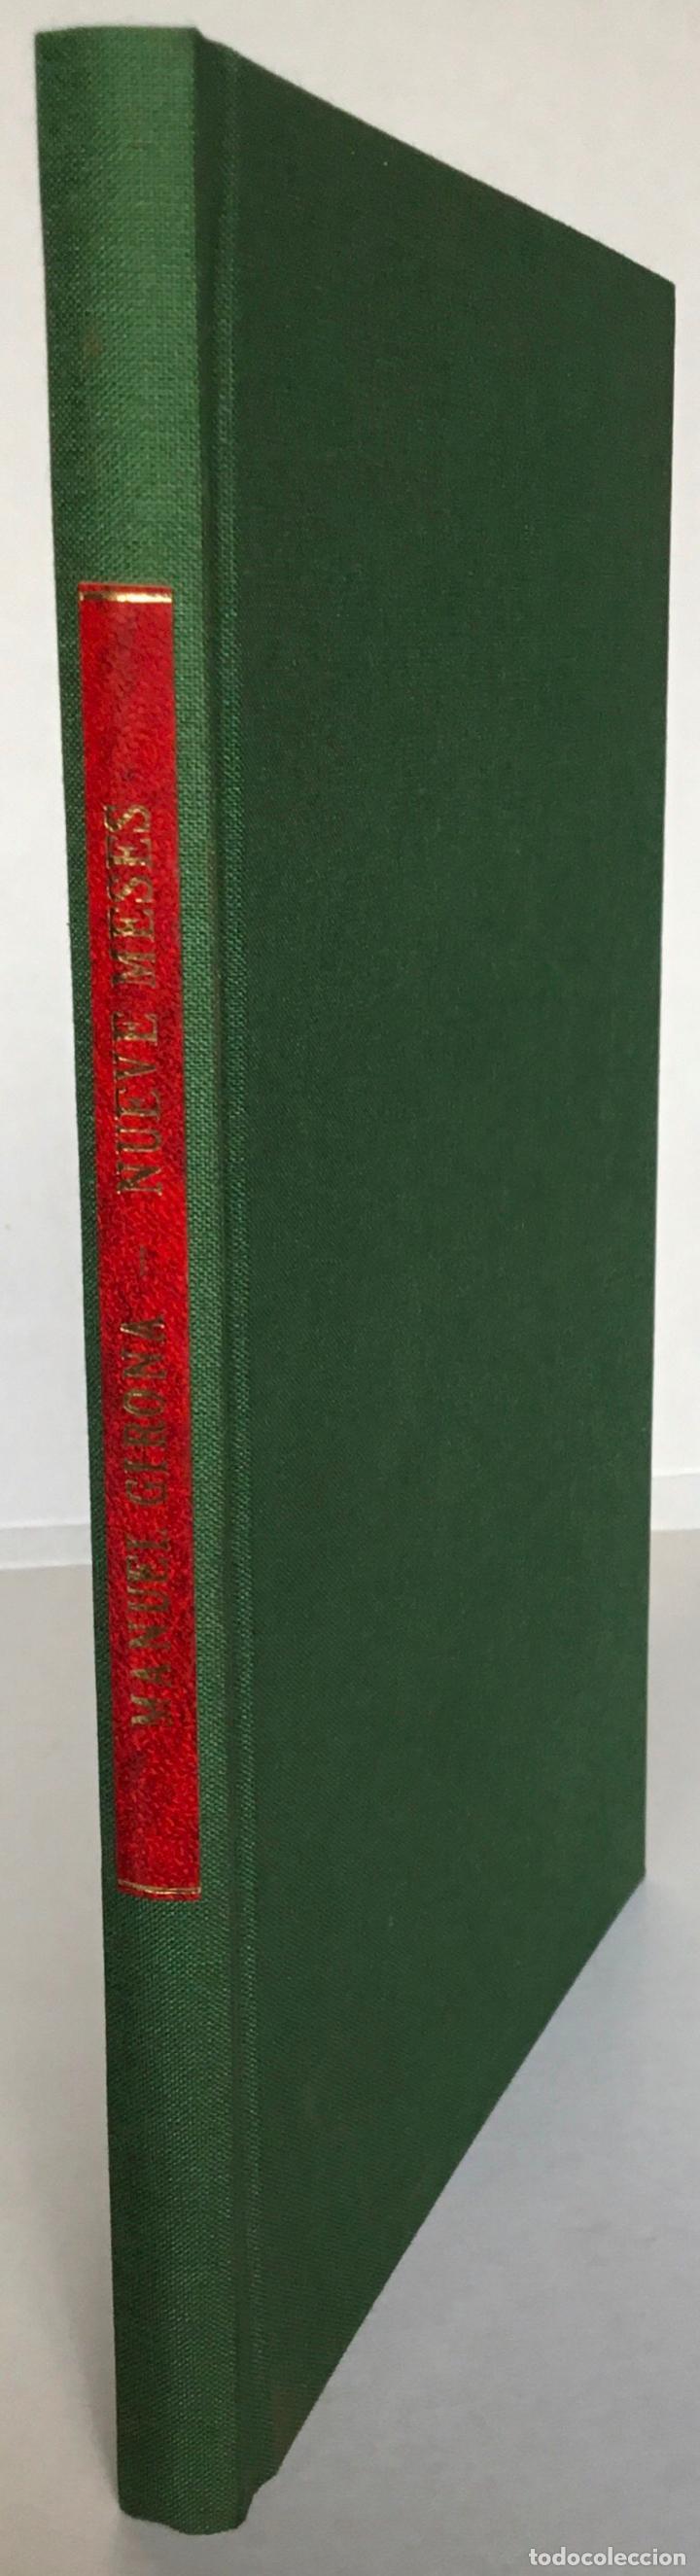 Libros antiguos: MEMORANDUM. NUEVE MESES DE ALCALDE PRIMERO DE BARCELONA. - GIRONA, Manuel. - Foto 2 - 123194972